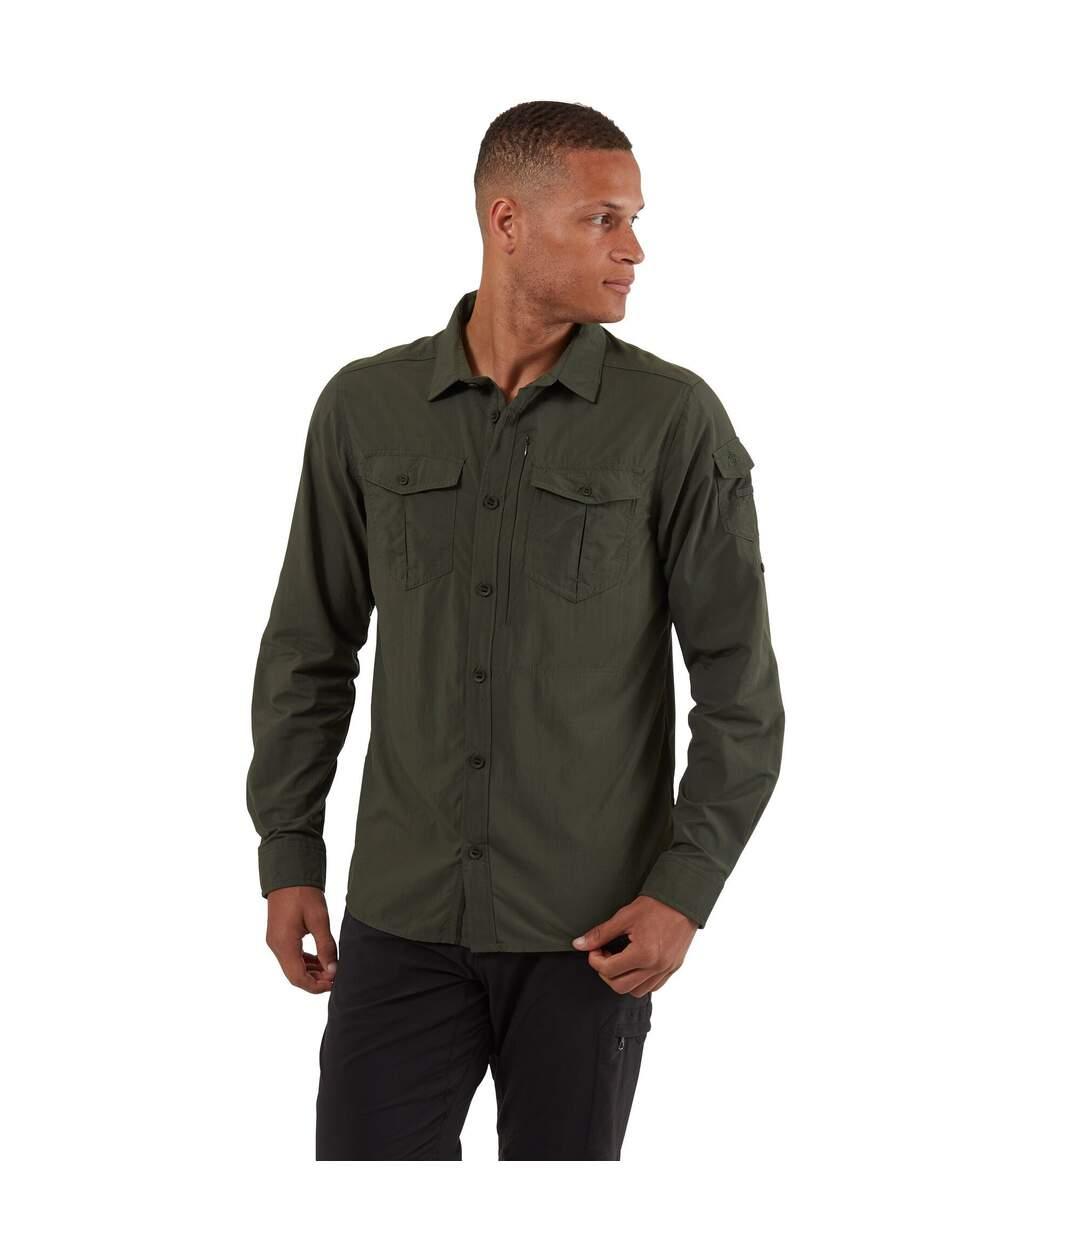 Craghoppers Mens NosiLife Adventure II Long Sleeved Shirt (Dark Khaki) - UTCG1085